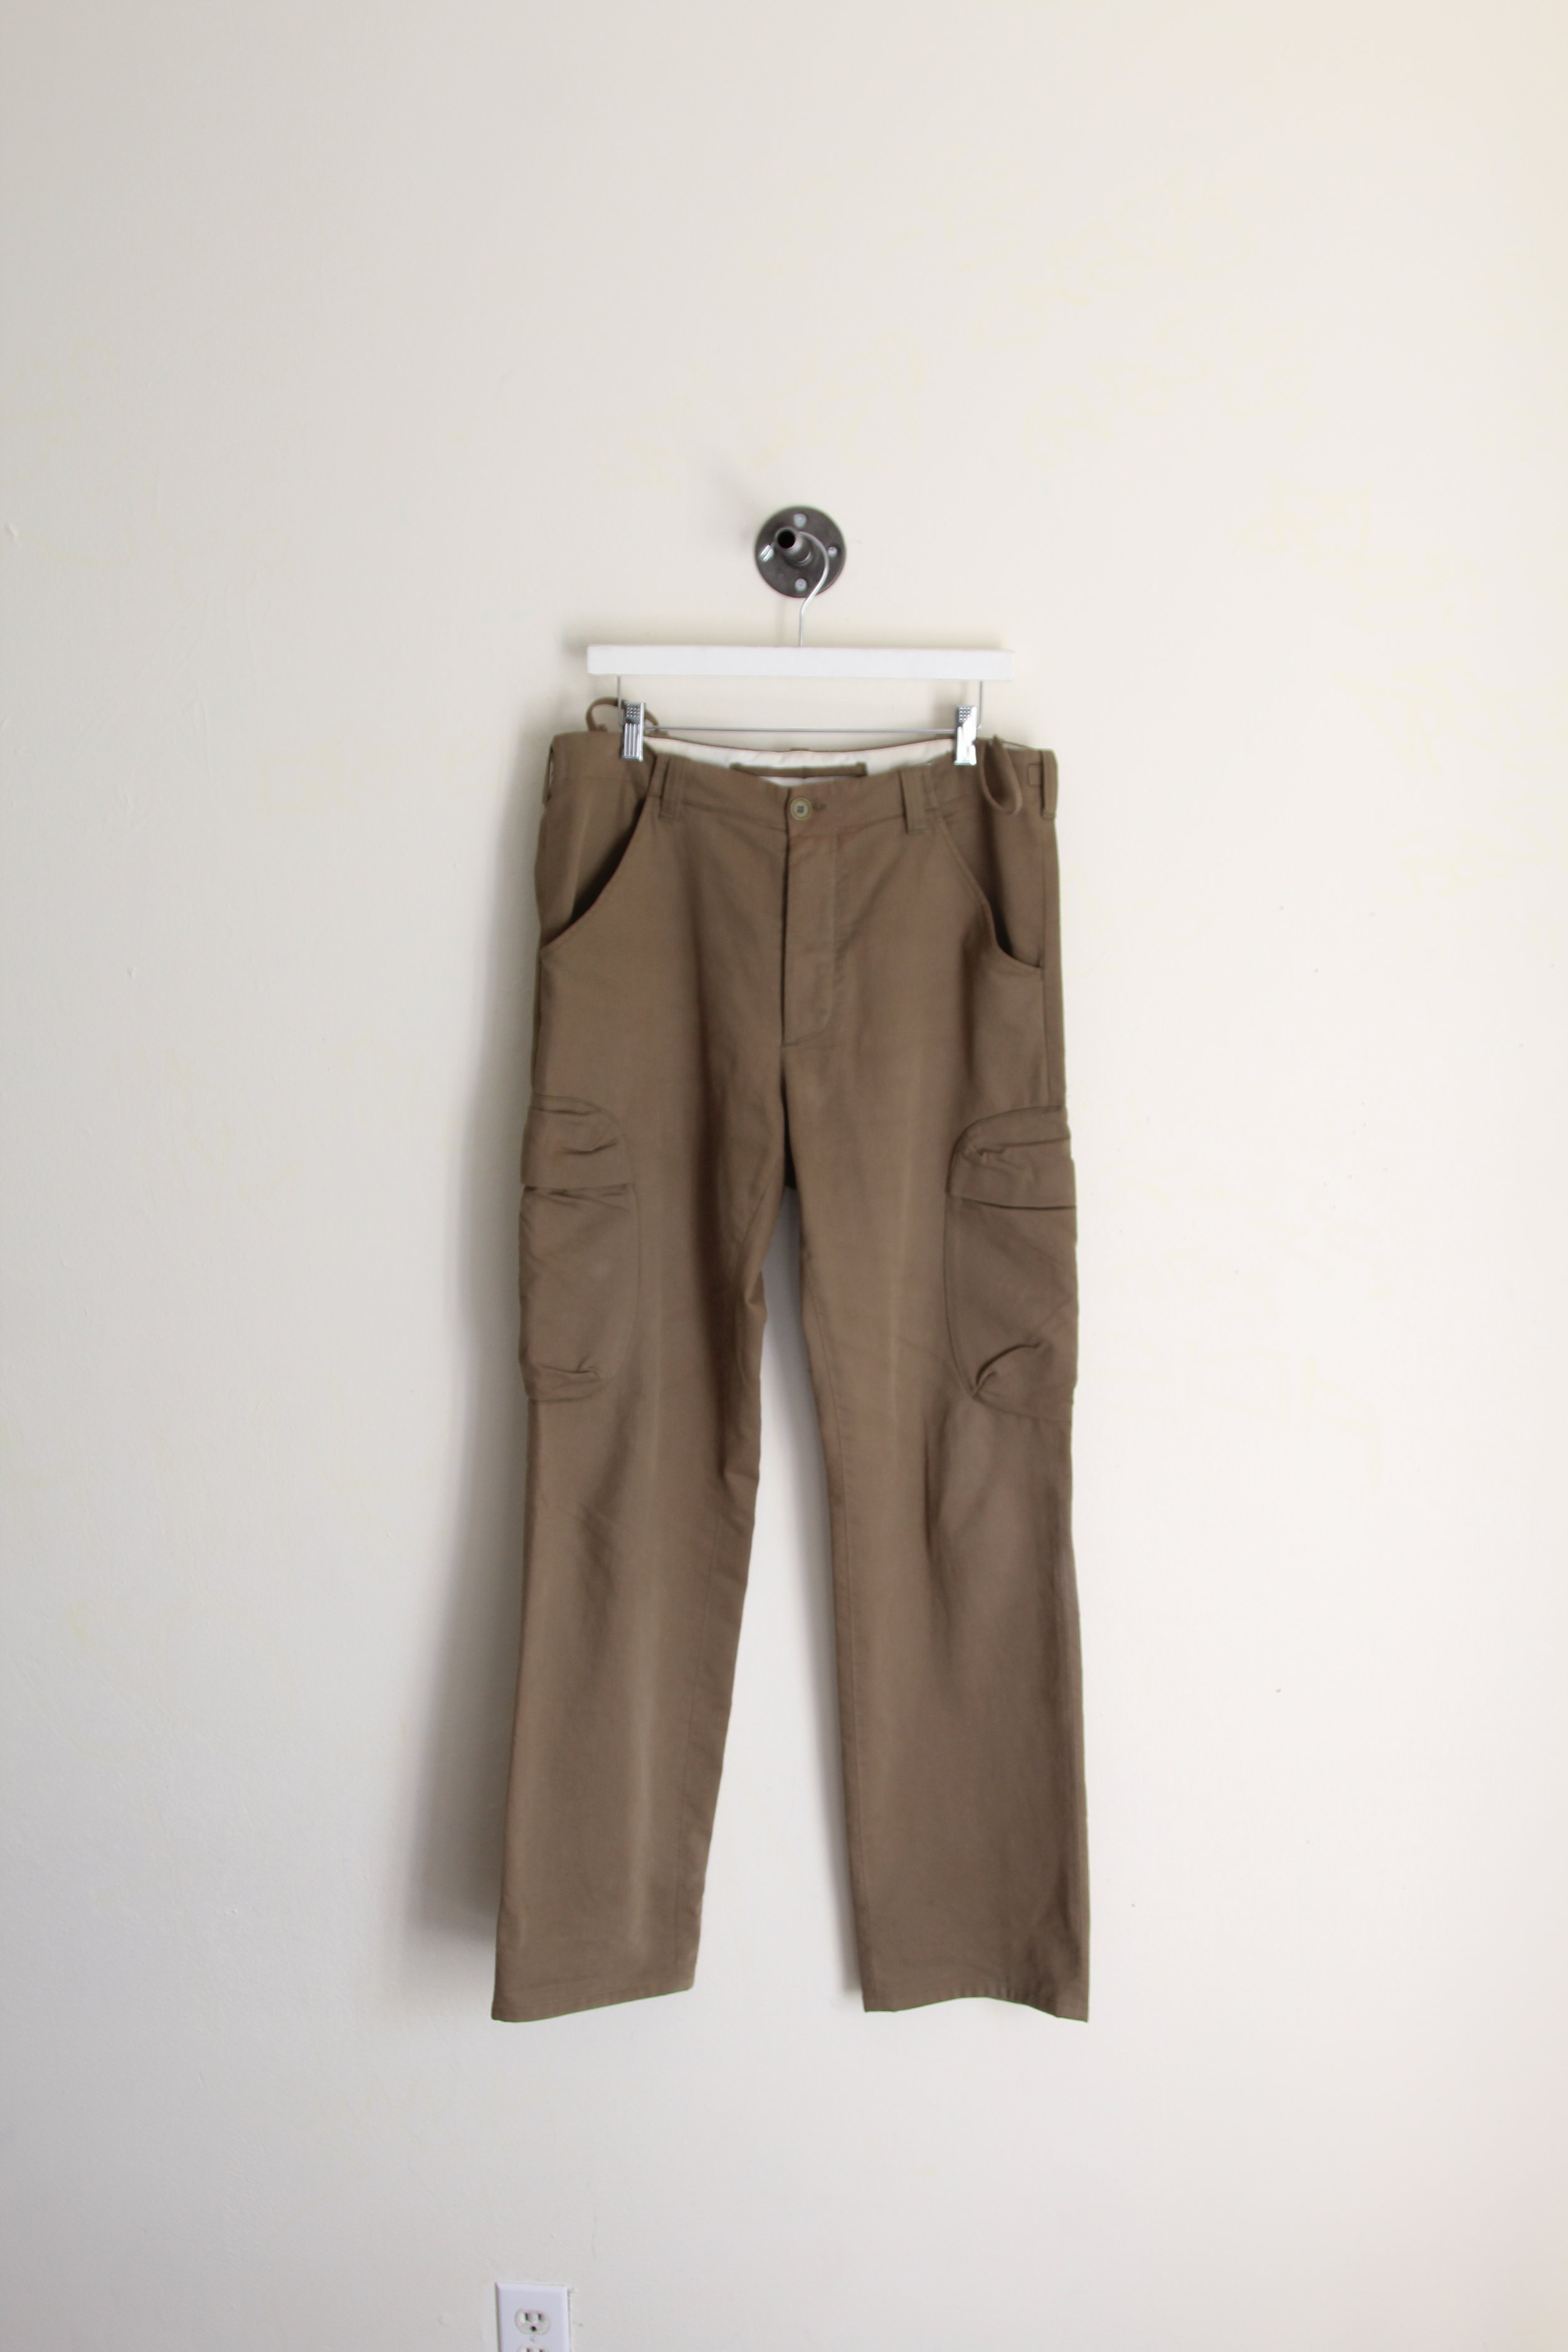 Helmut Lang SS 2000 Grenadier Cargo Trousers